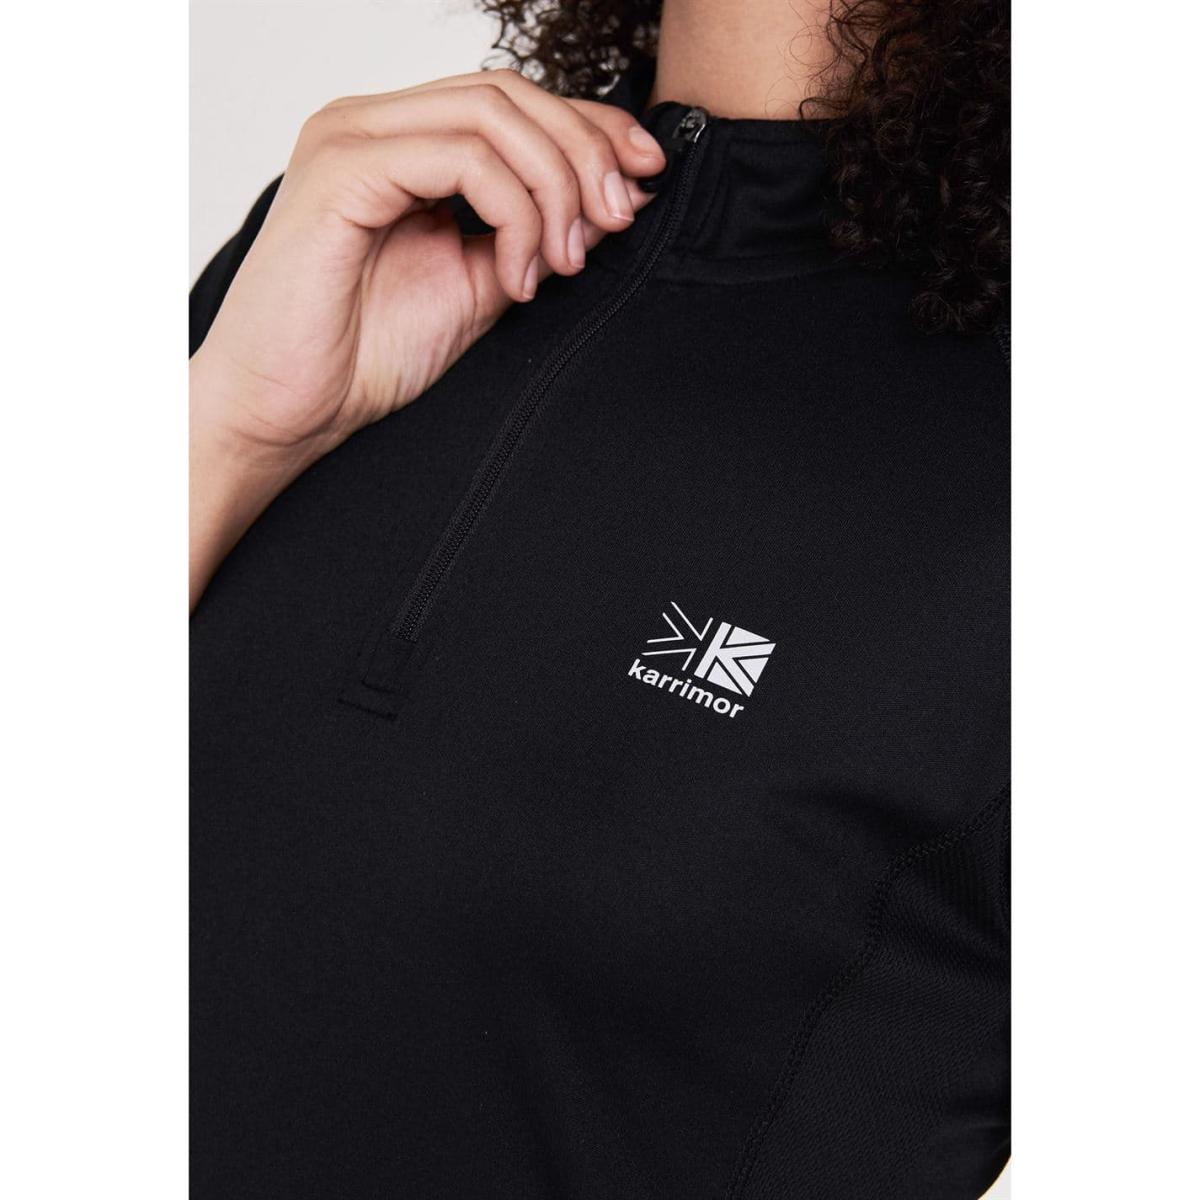 Karrimor Quarter Zip Kurzarm Polohemd Poloshirt Damen